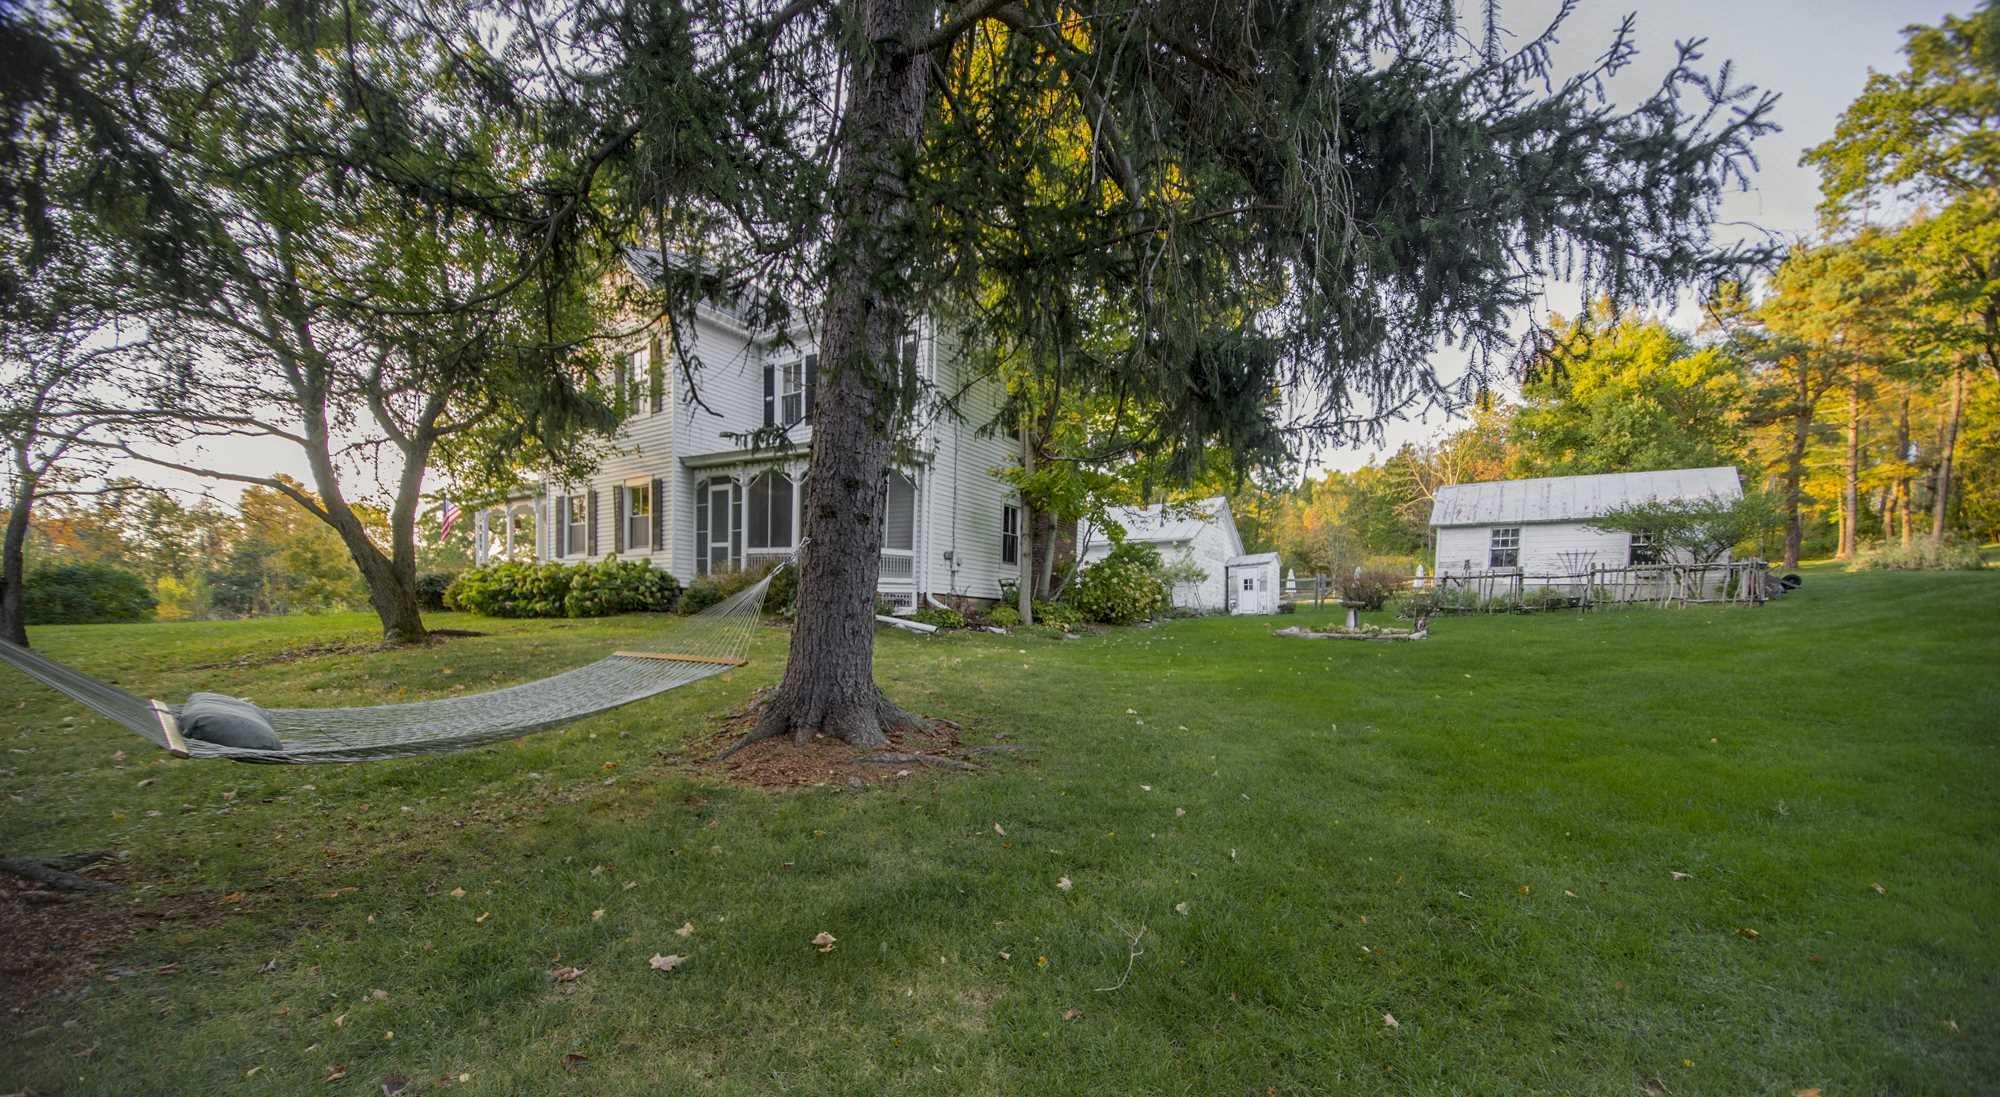 Single Family Home for Rent at 301 DEER HAVEN ROAD 301 DEER HAVEN ROAD Elizaville, New York 12523 United States